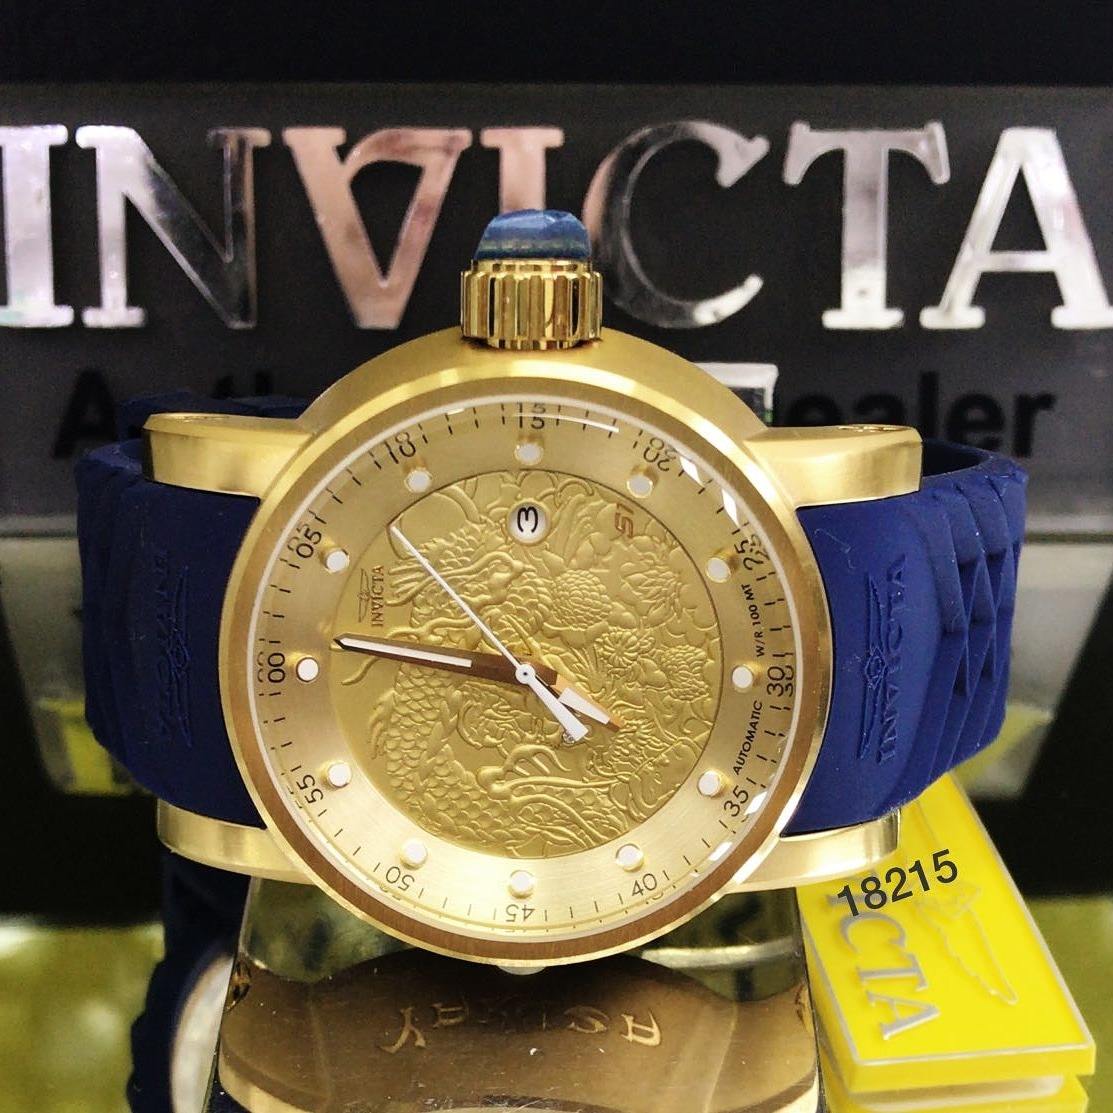 446ce3c73e0 relógio invicta yakuza 18215 original automático b. ouro 18k. Carregando  zoom.